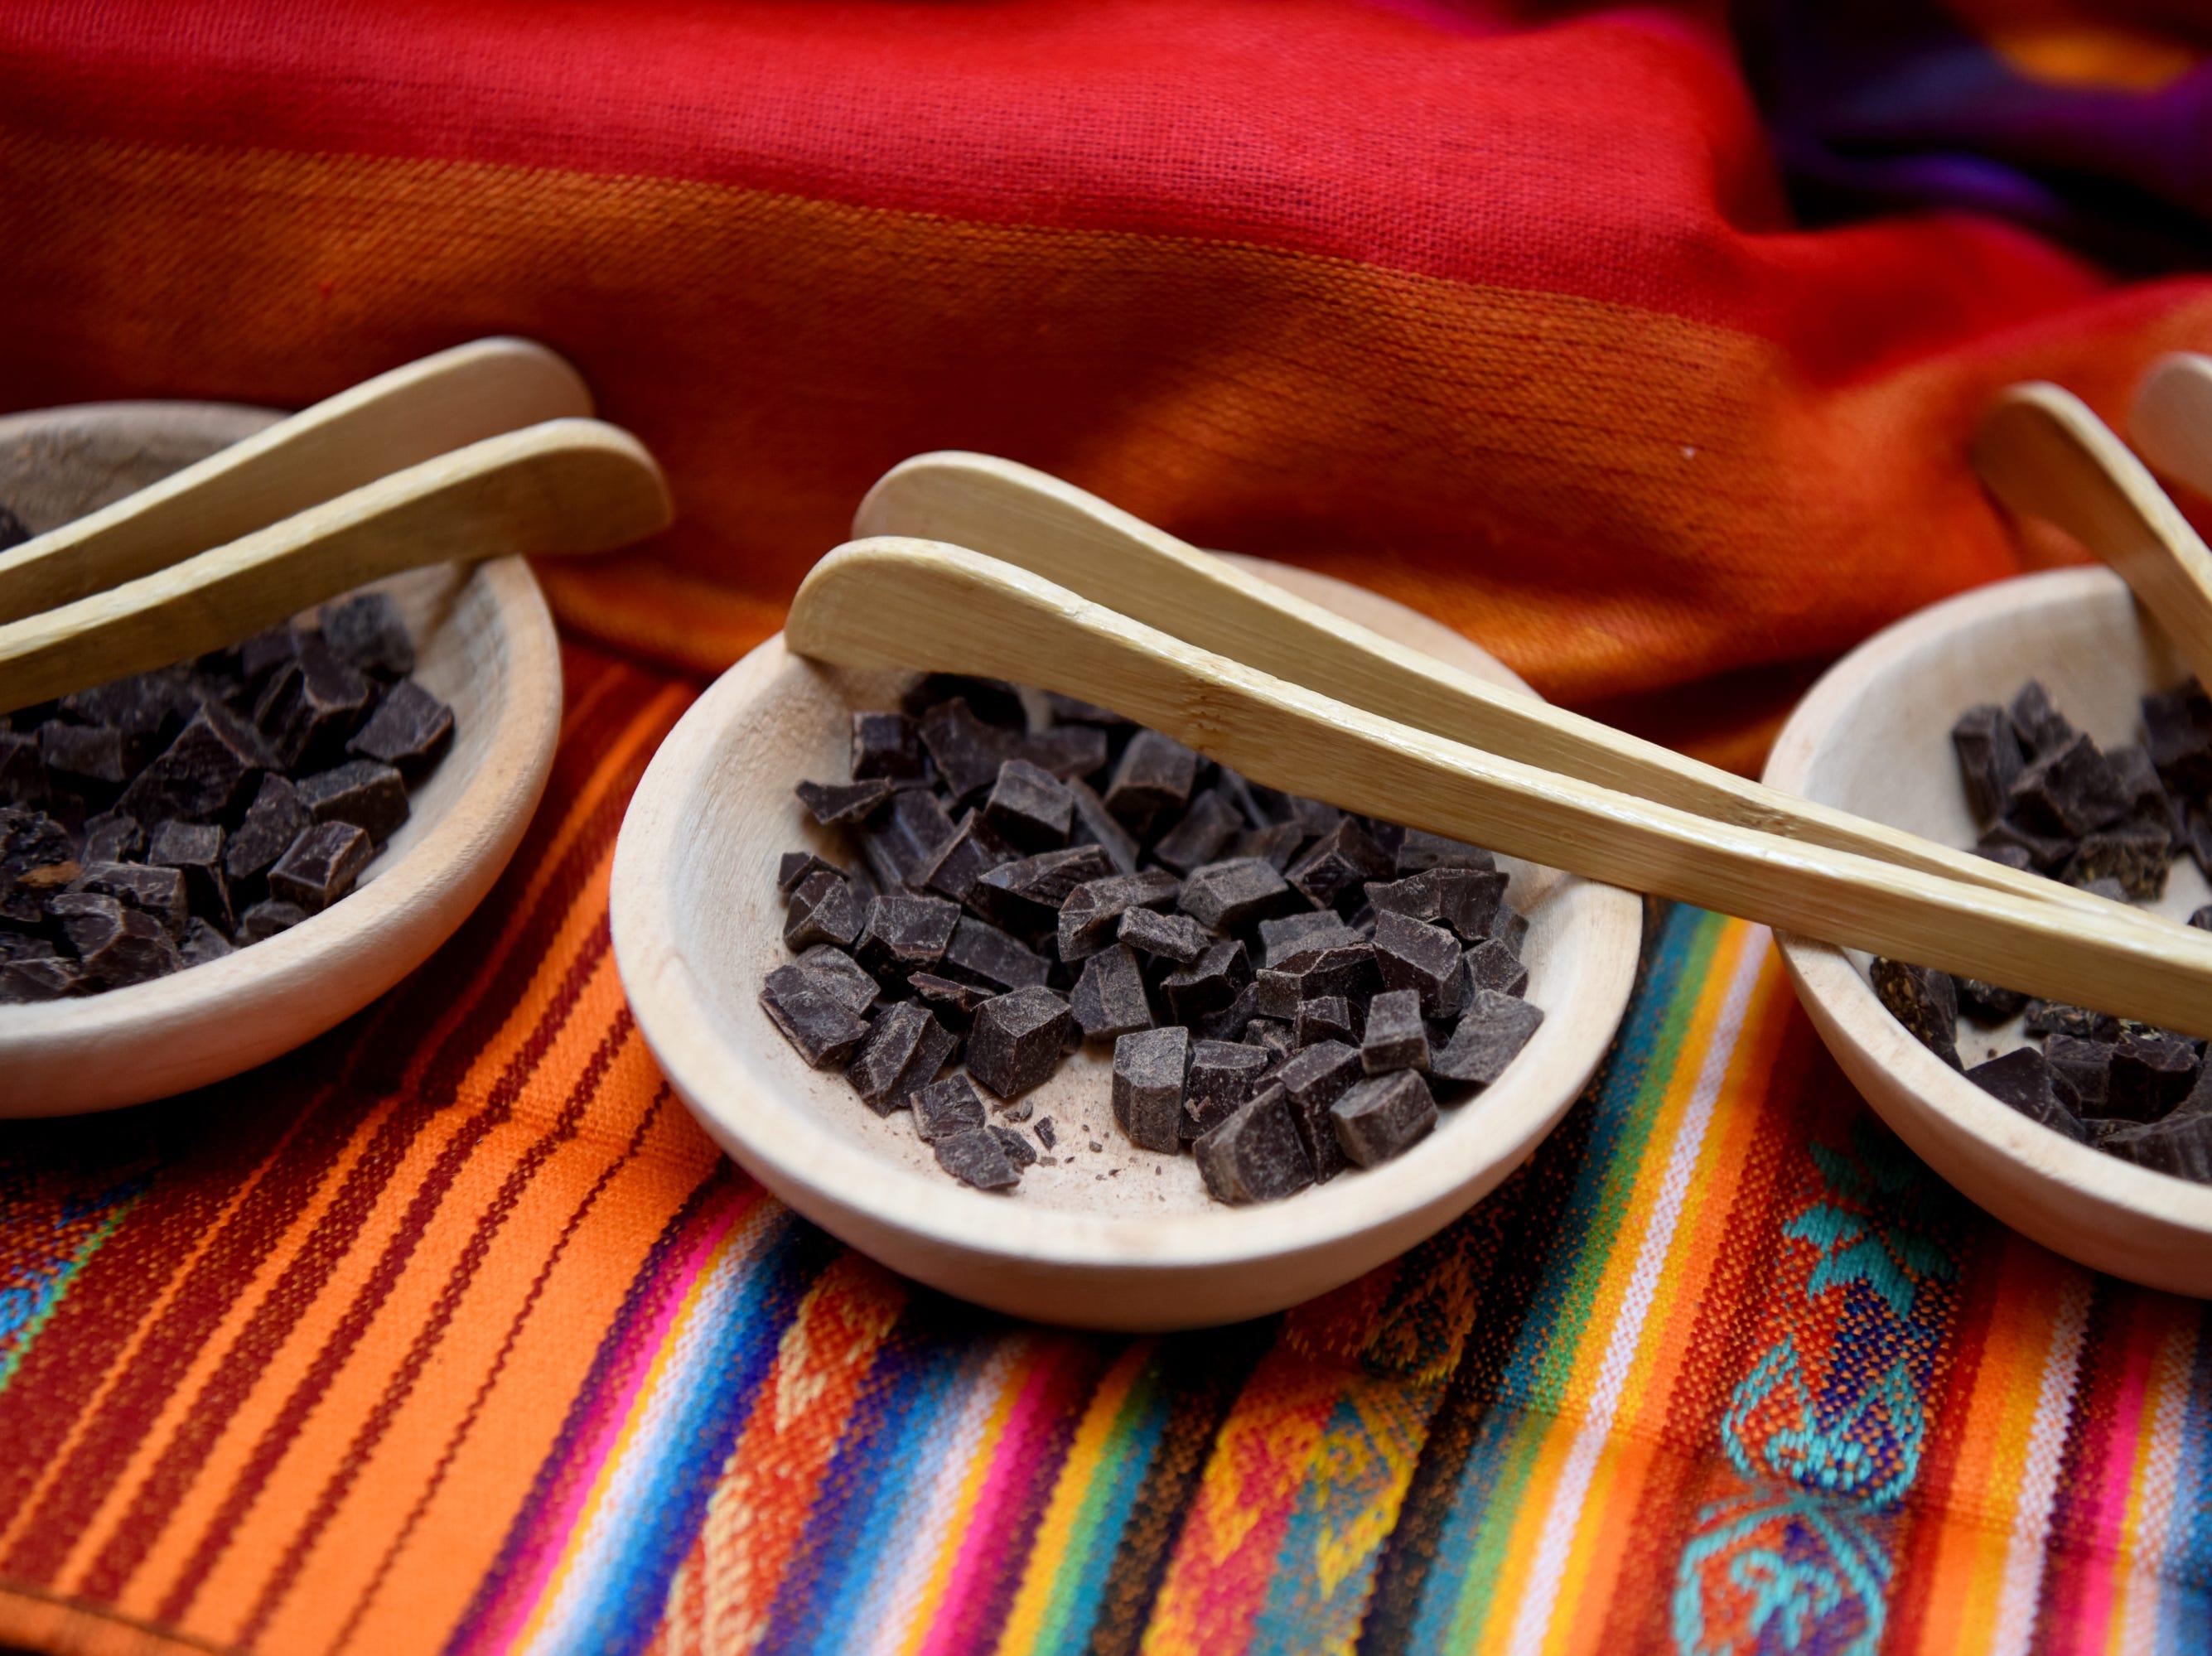 Villakuyaya Organic Dark Chocolate samples at the Chocolate Expo, held  Sunday, January 27, 2019, at Westfield Garden State Plaza in Paramus.